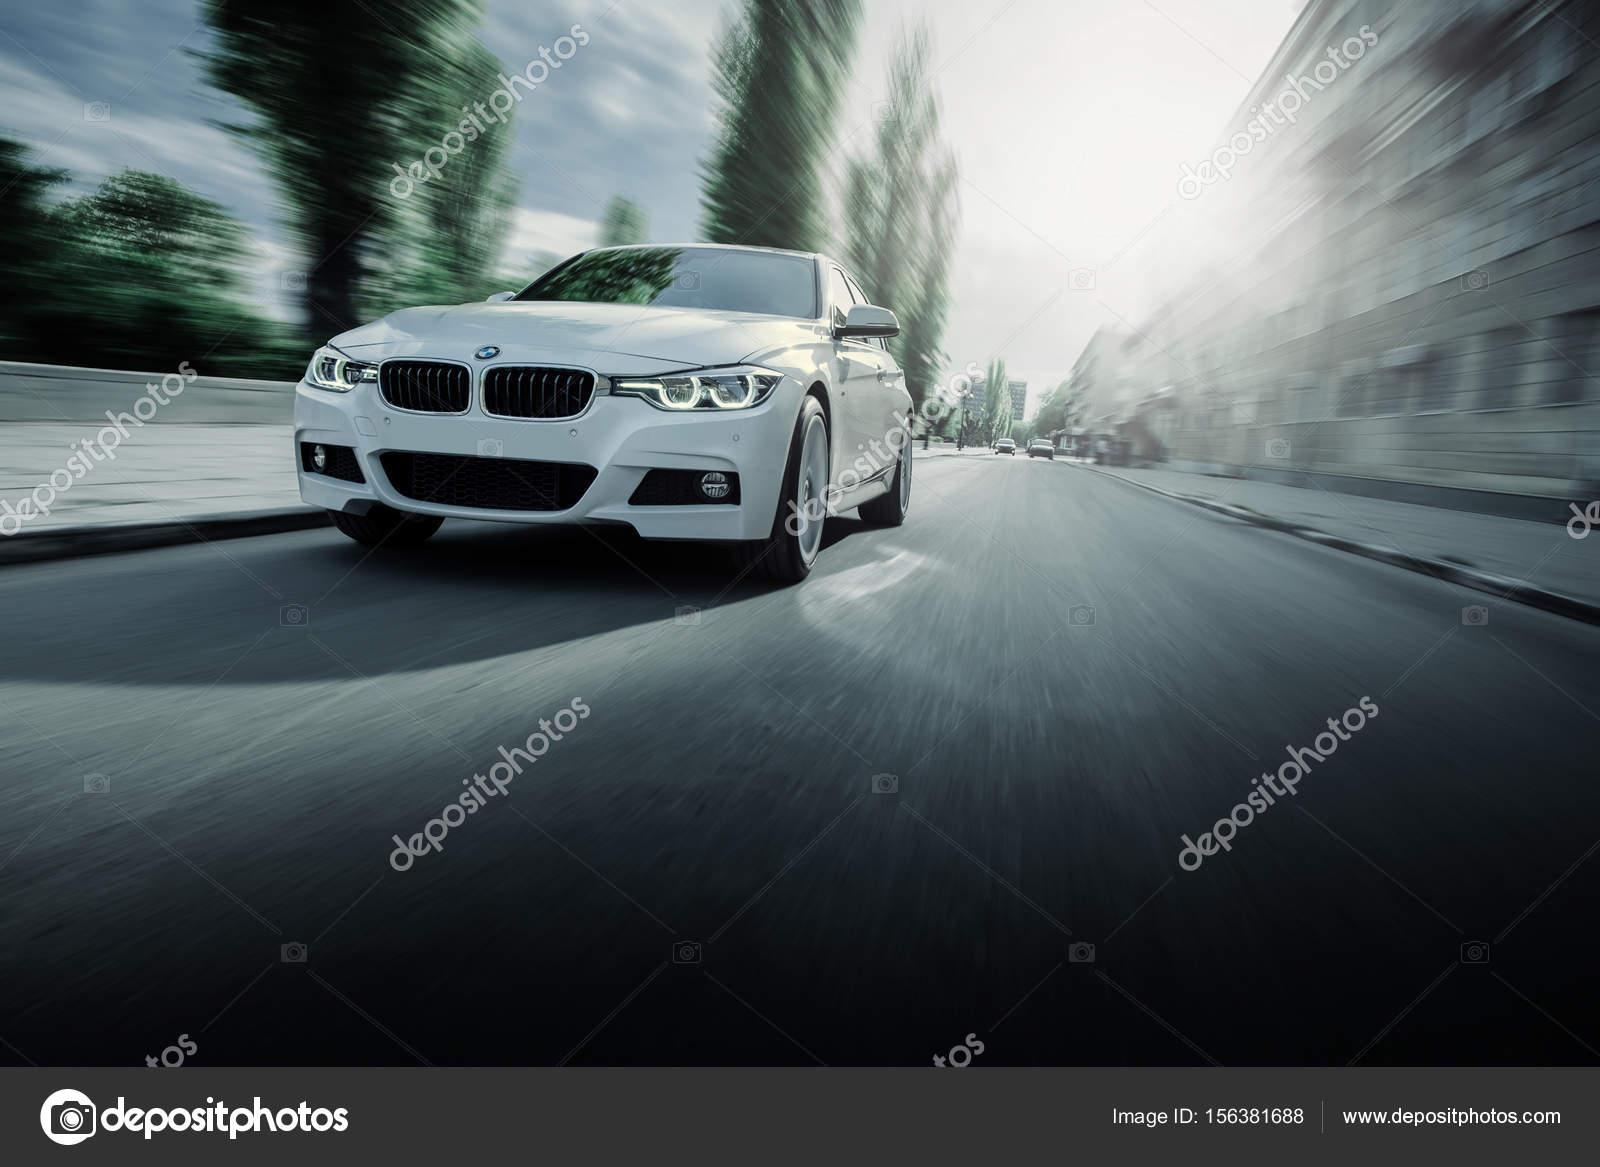 blanco bmw 3 serie f30 coche est conduciendo en carretera asfaltada 2009 BMW 3 Series blanco bmw 3 serie f30 coche est conduciendo en carretera asfaltada en d a de verano